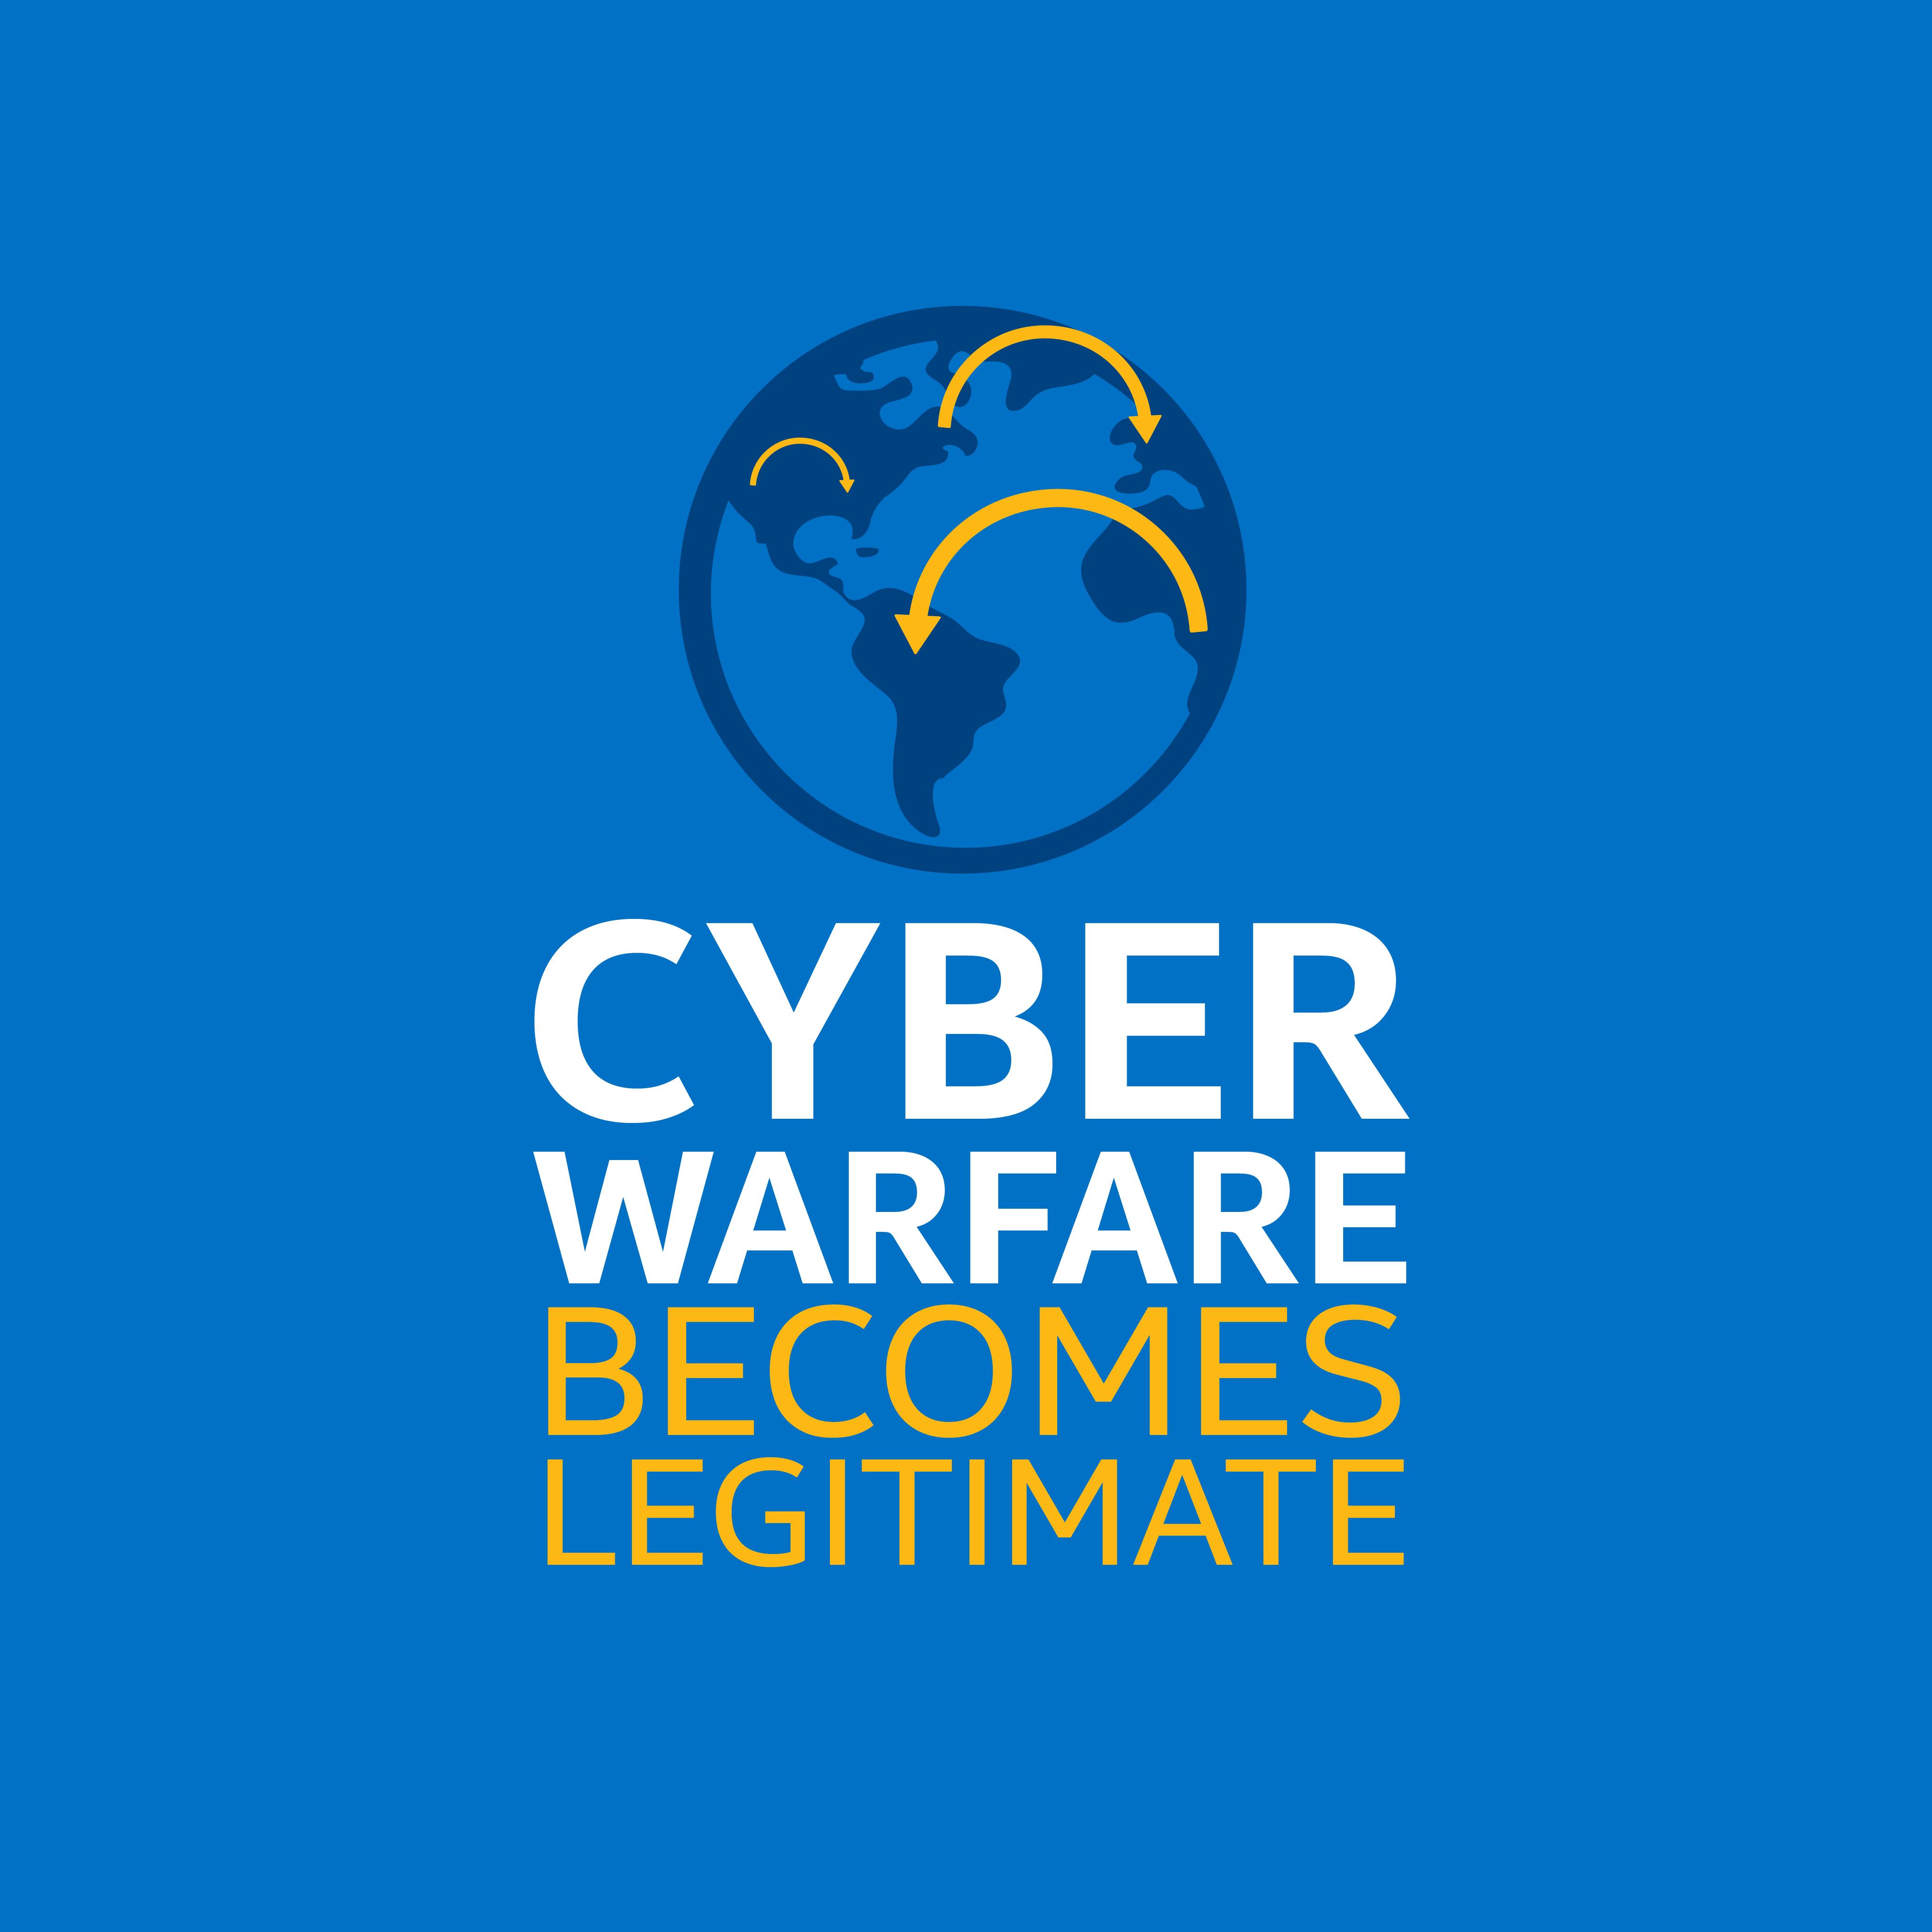 Cyber-Warefare.png